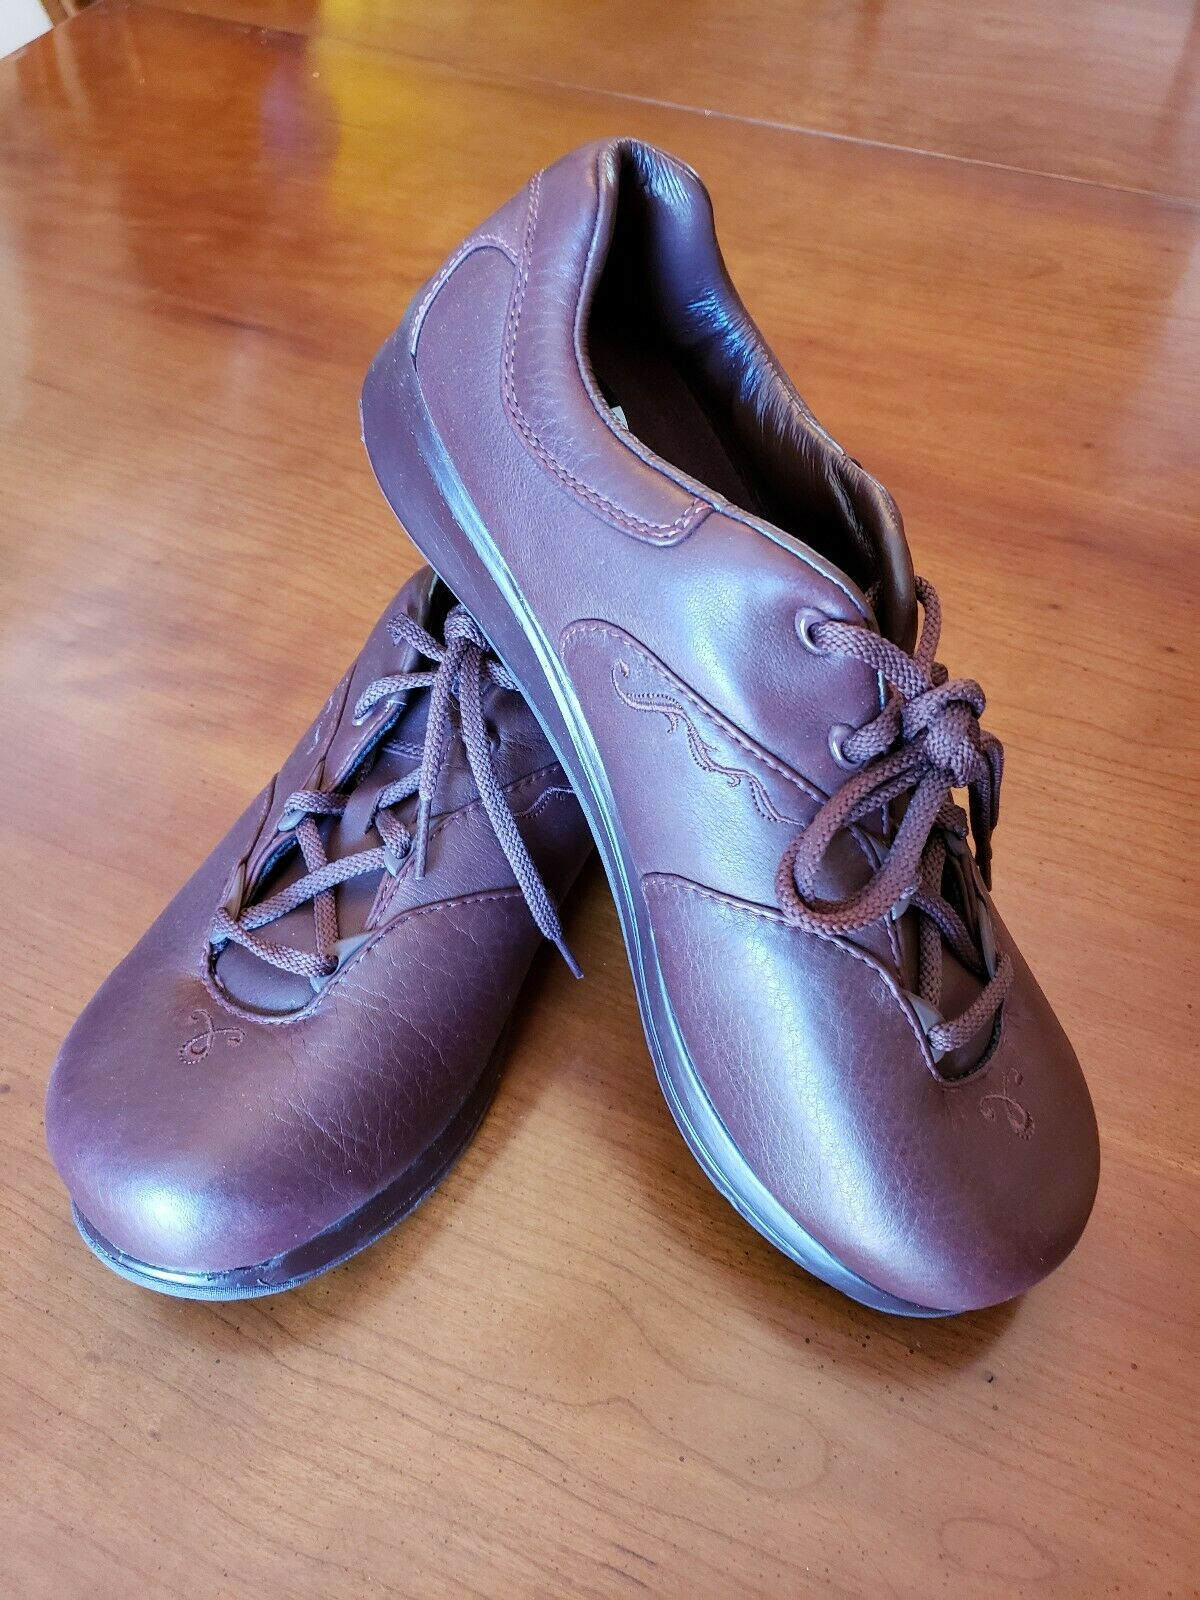 New Balance 901 Encap Womens Brown Walking shoes Sz 11-2E Round Toe WW901BR SL-2